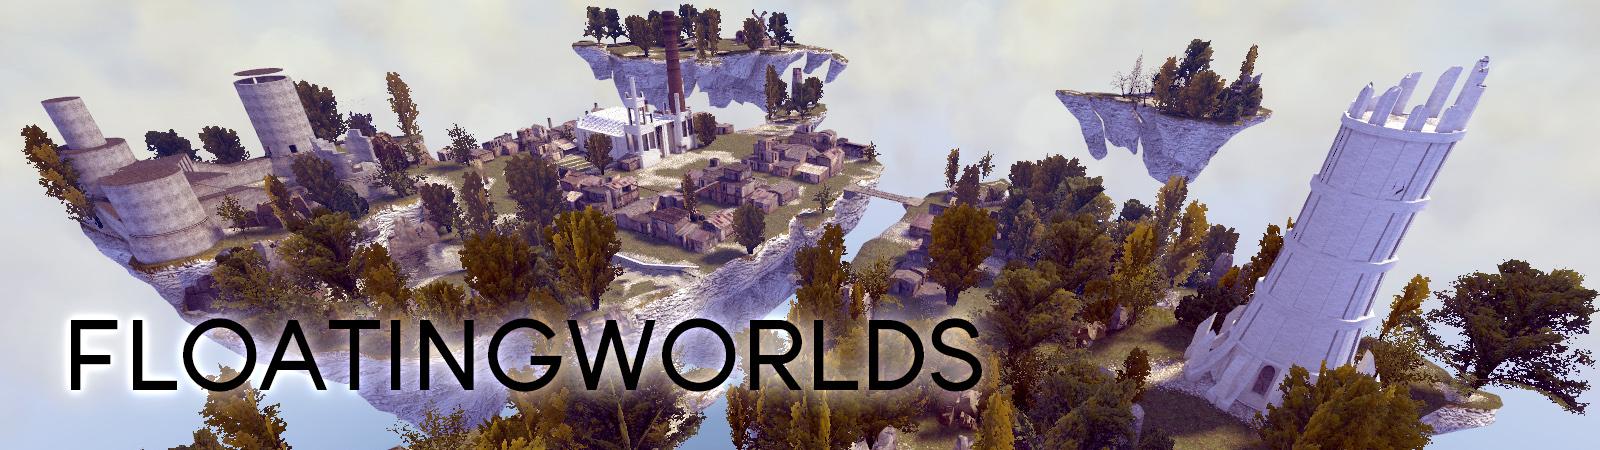 Floatingworlds